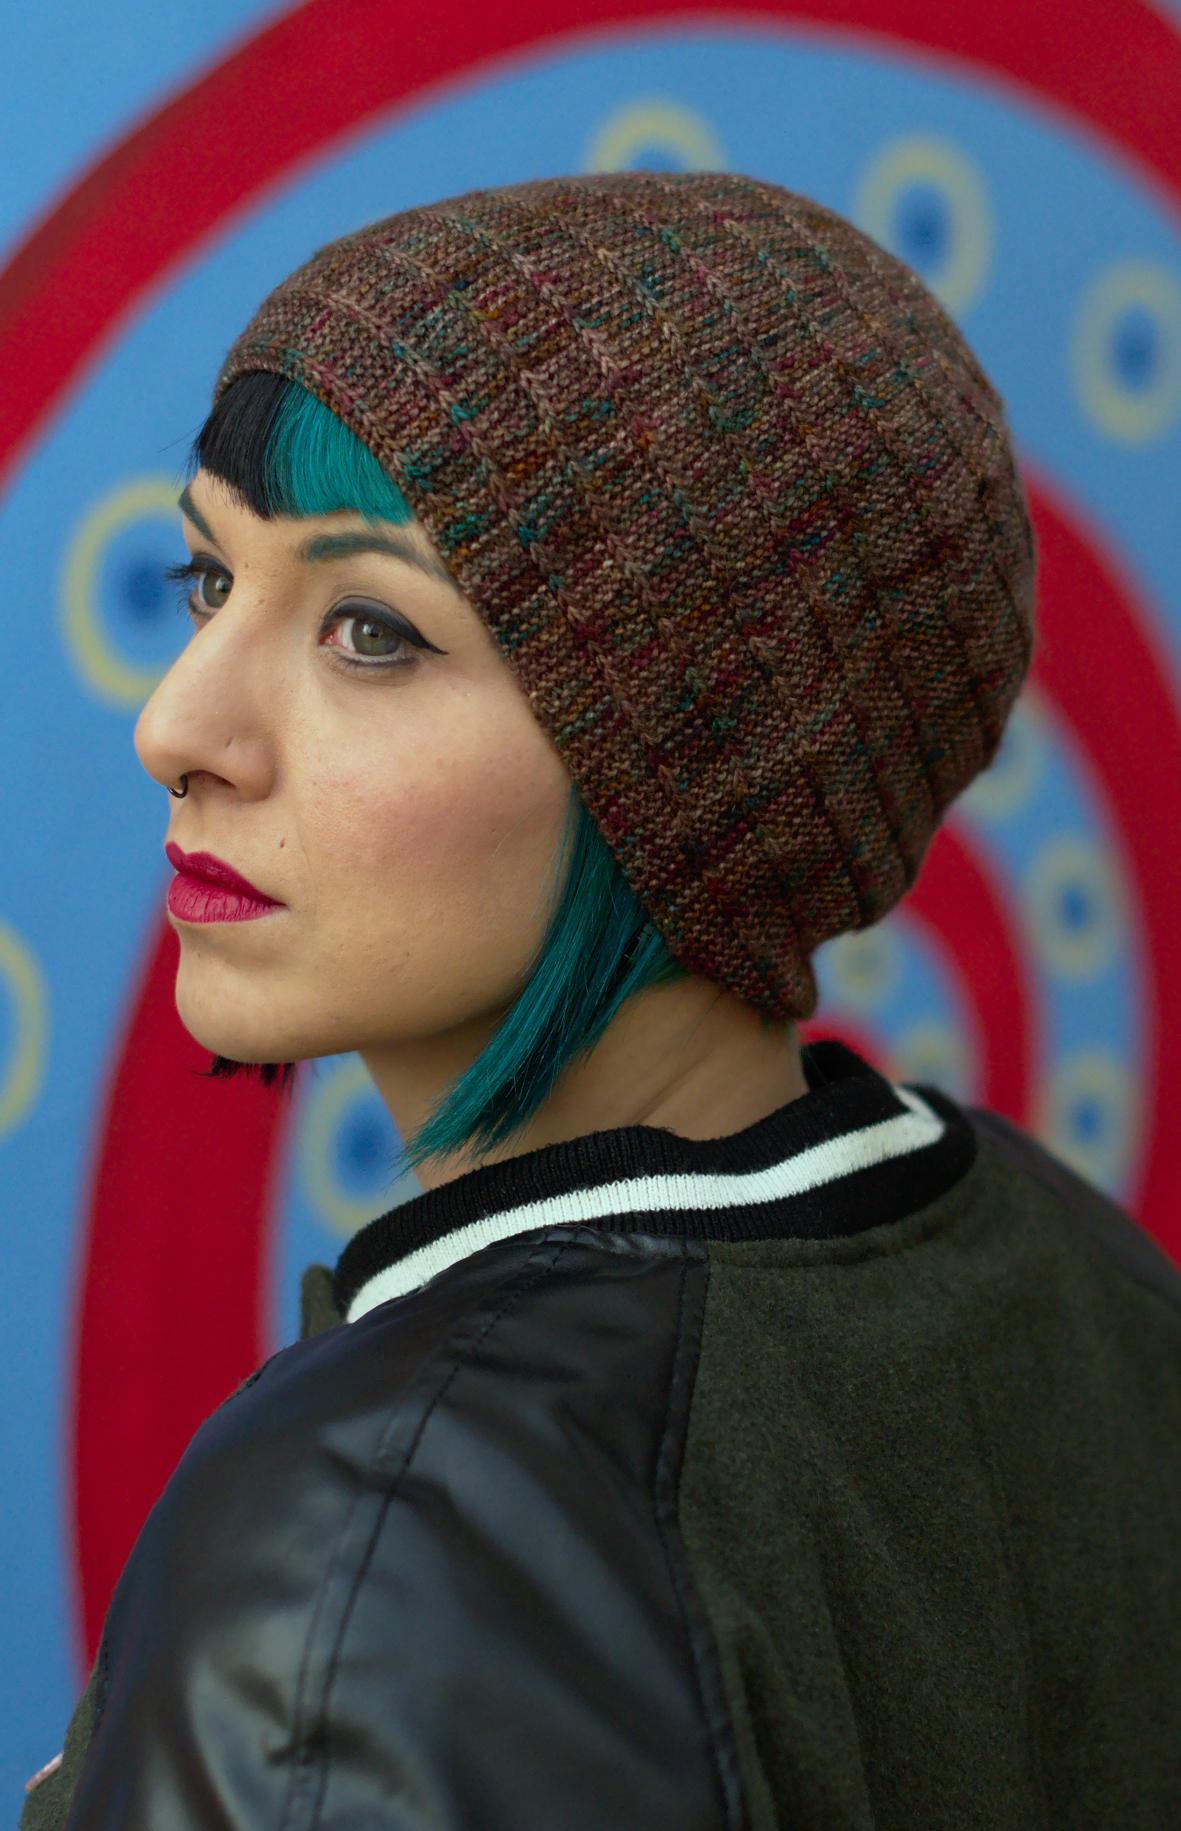 Circled 4 sideways knit Hat knitting pattern featuring top down spiral